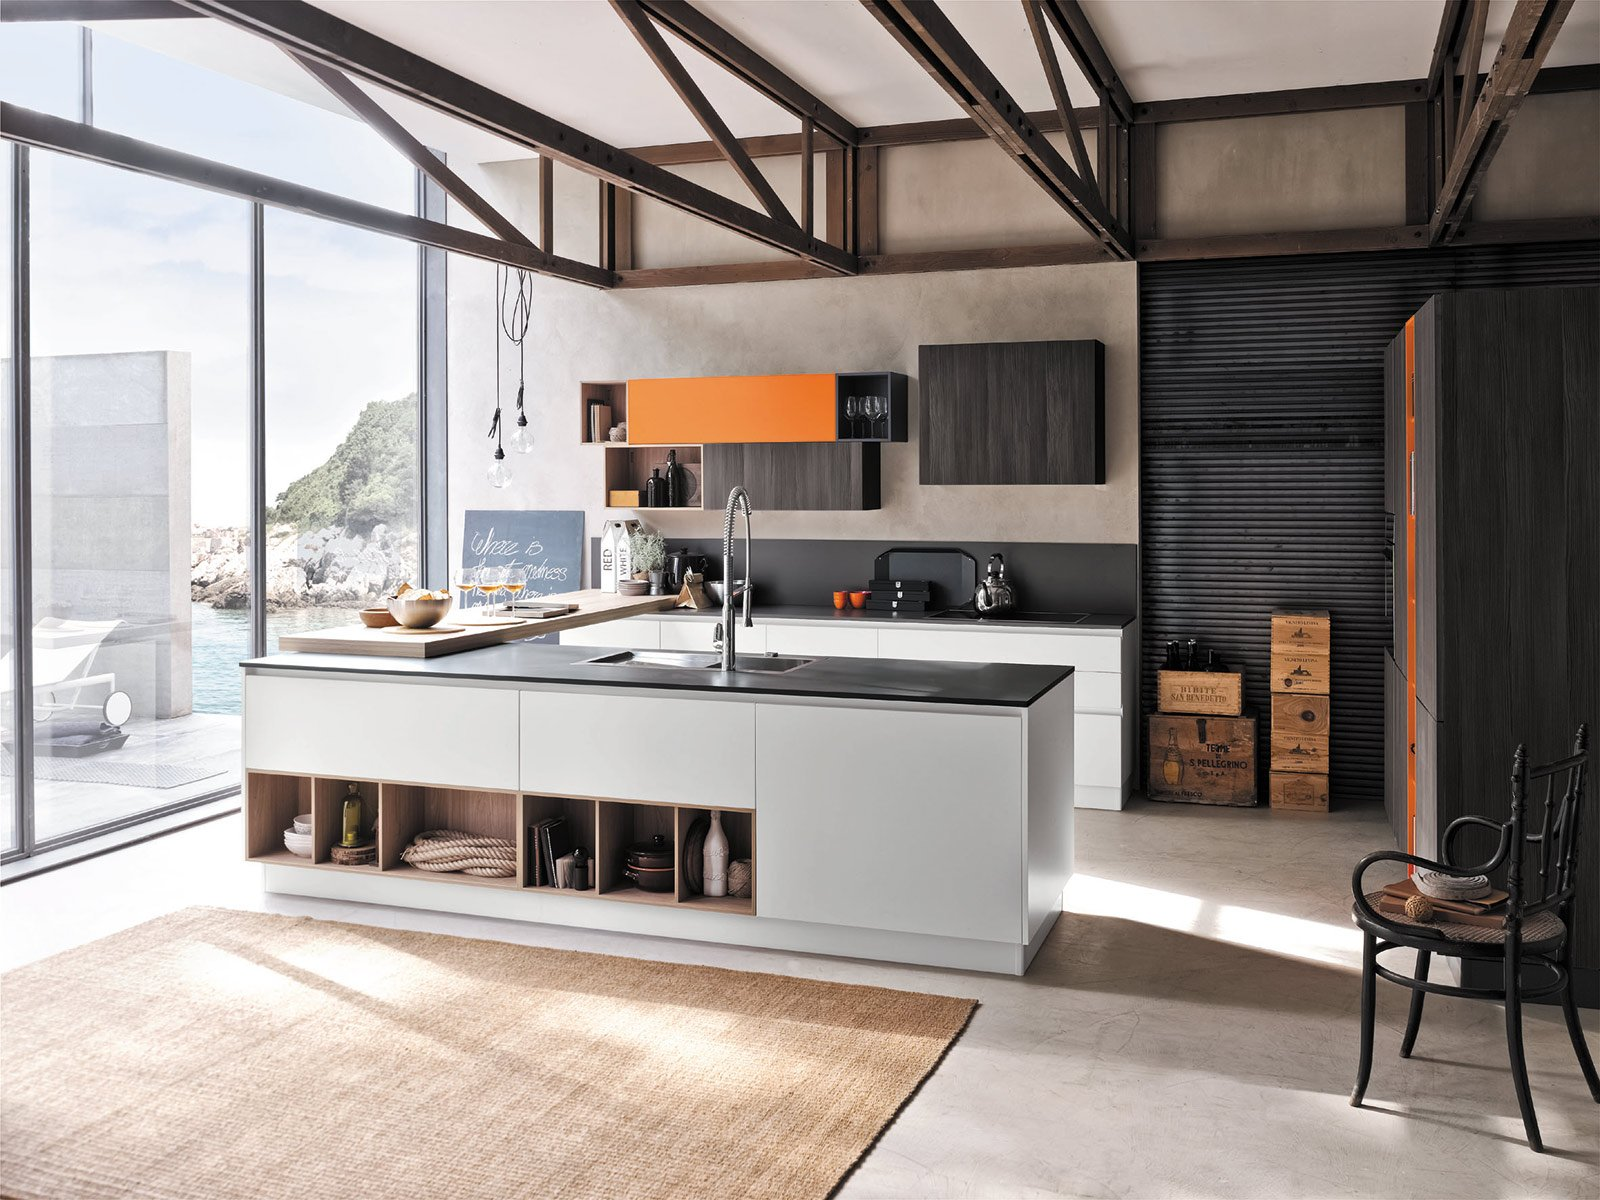 mensole design cucine moderne : Replay Next di Stosa si caratterizza per i colori inediti, raffinati e ...